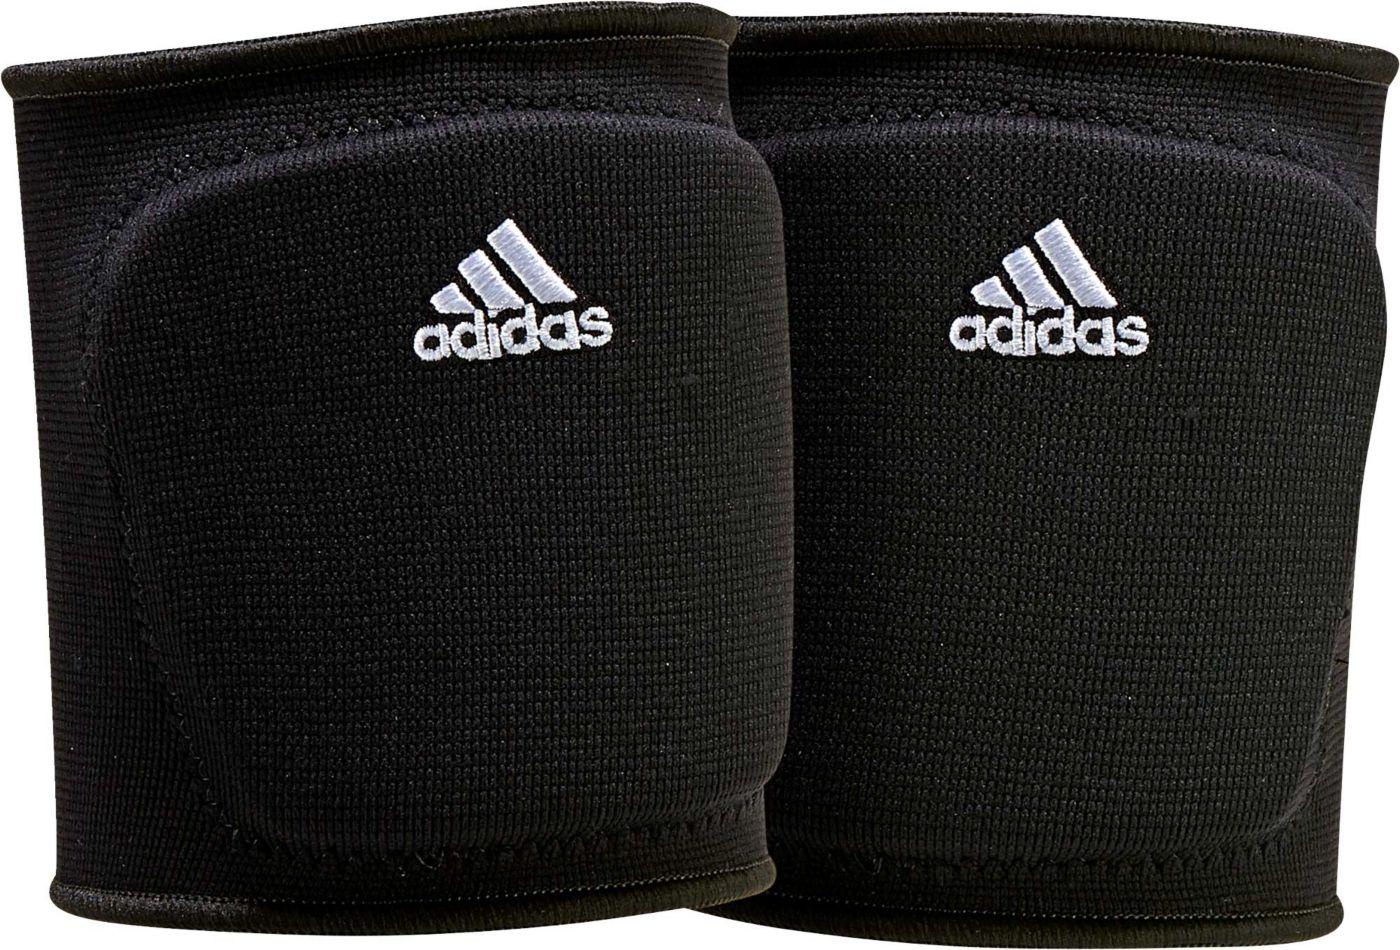 "adidas Adult 5"" Volleyball Knee Pads"